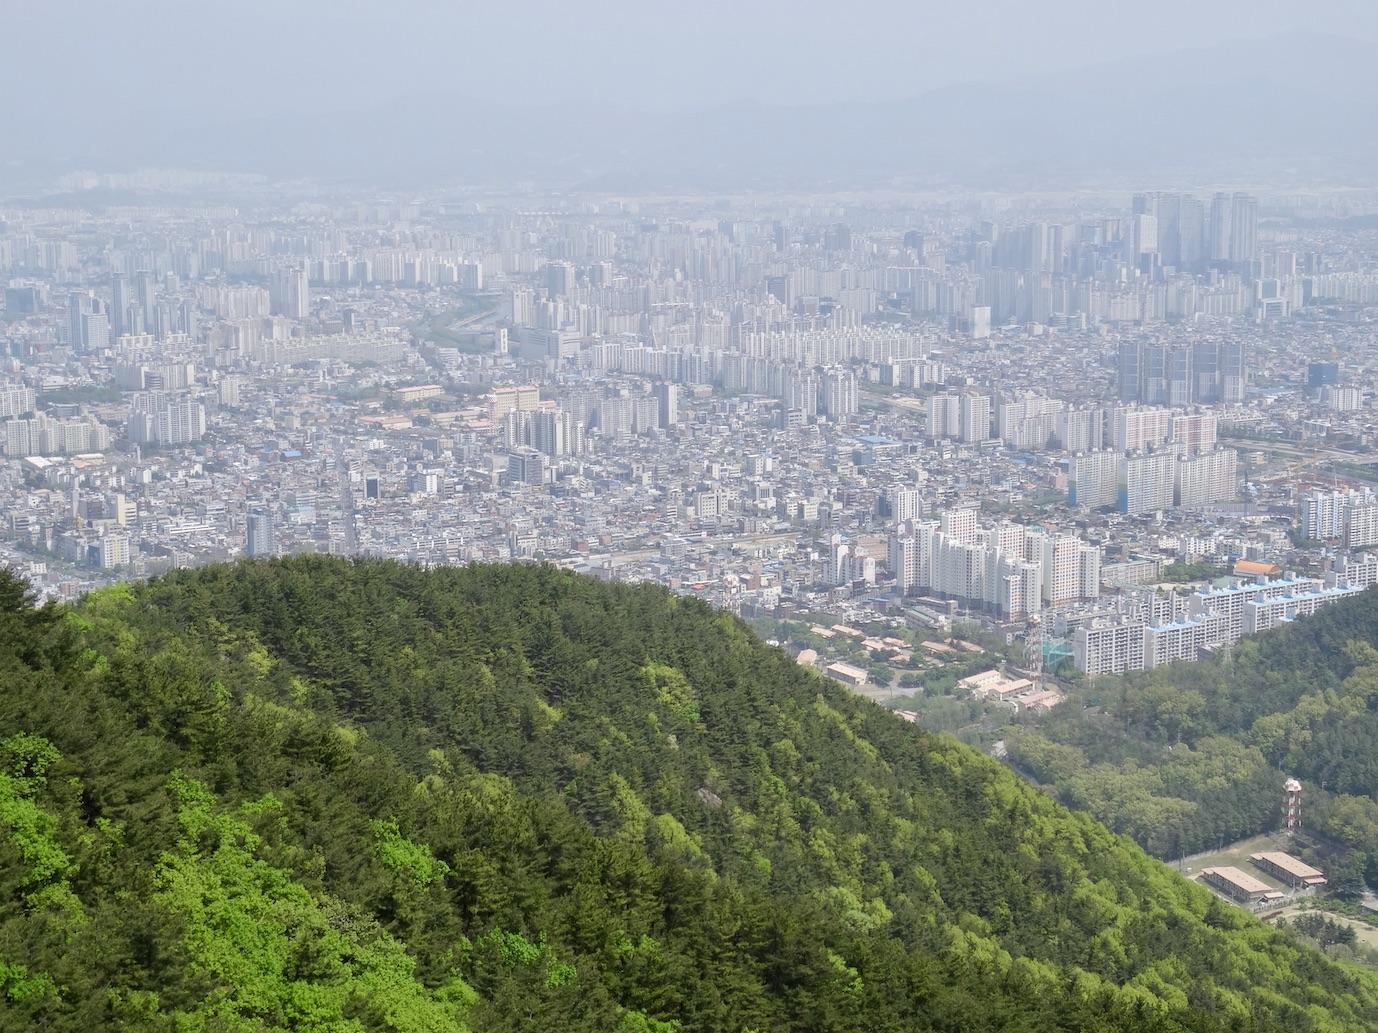 Apsan Mountain South Korea.